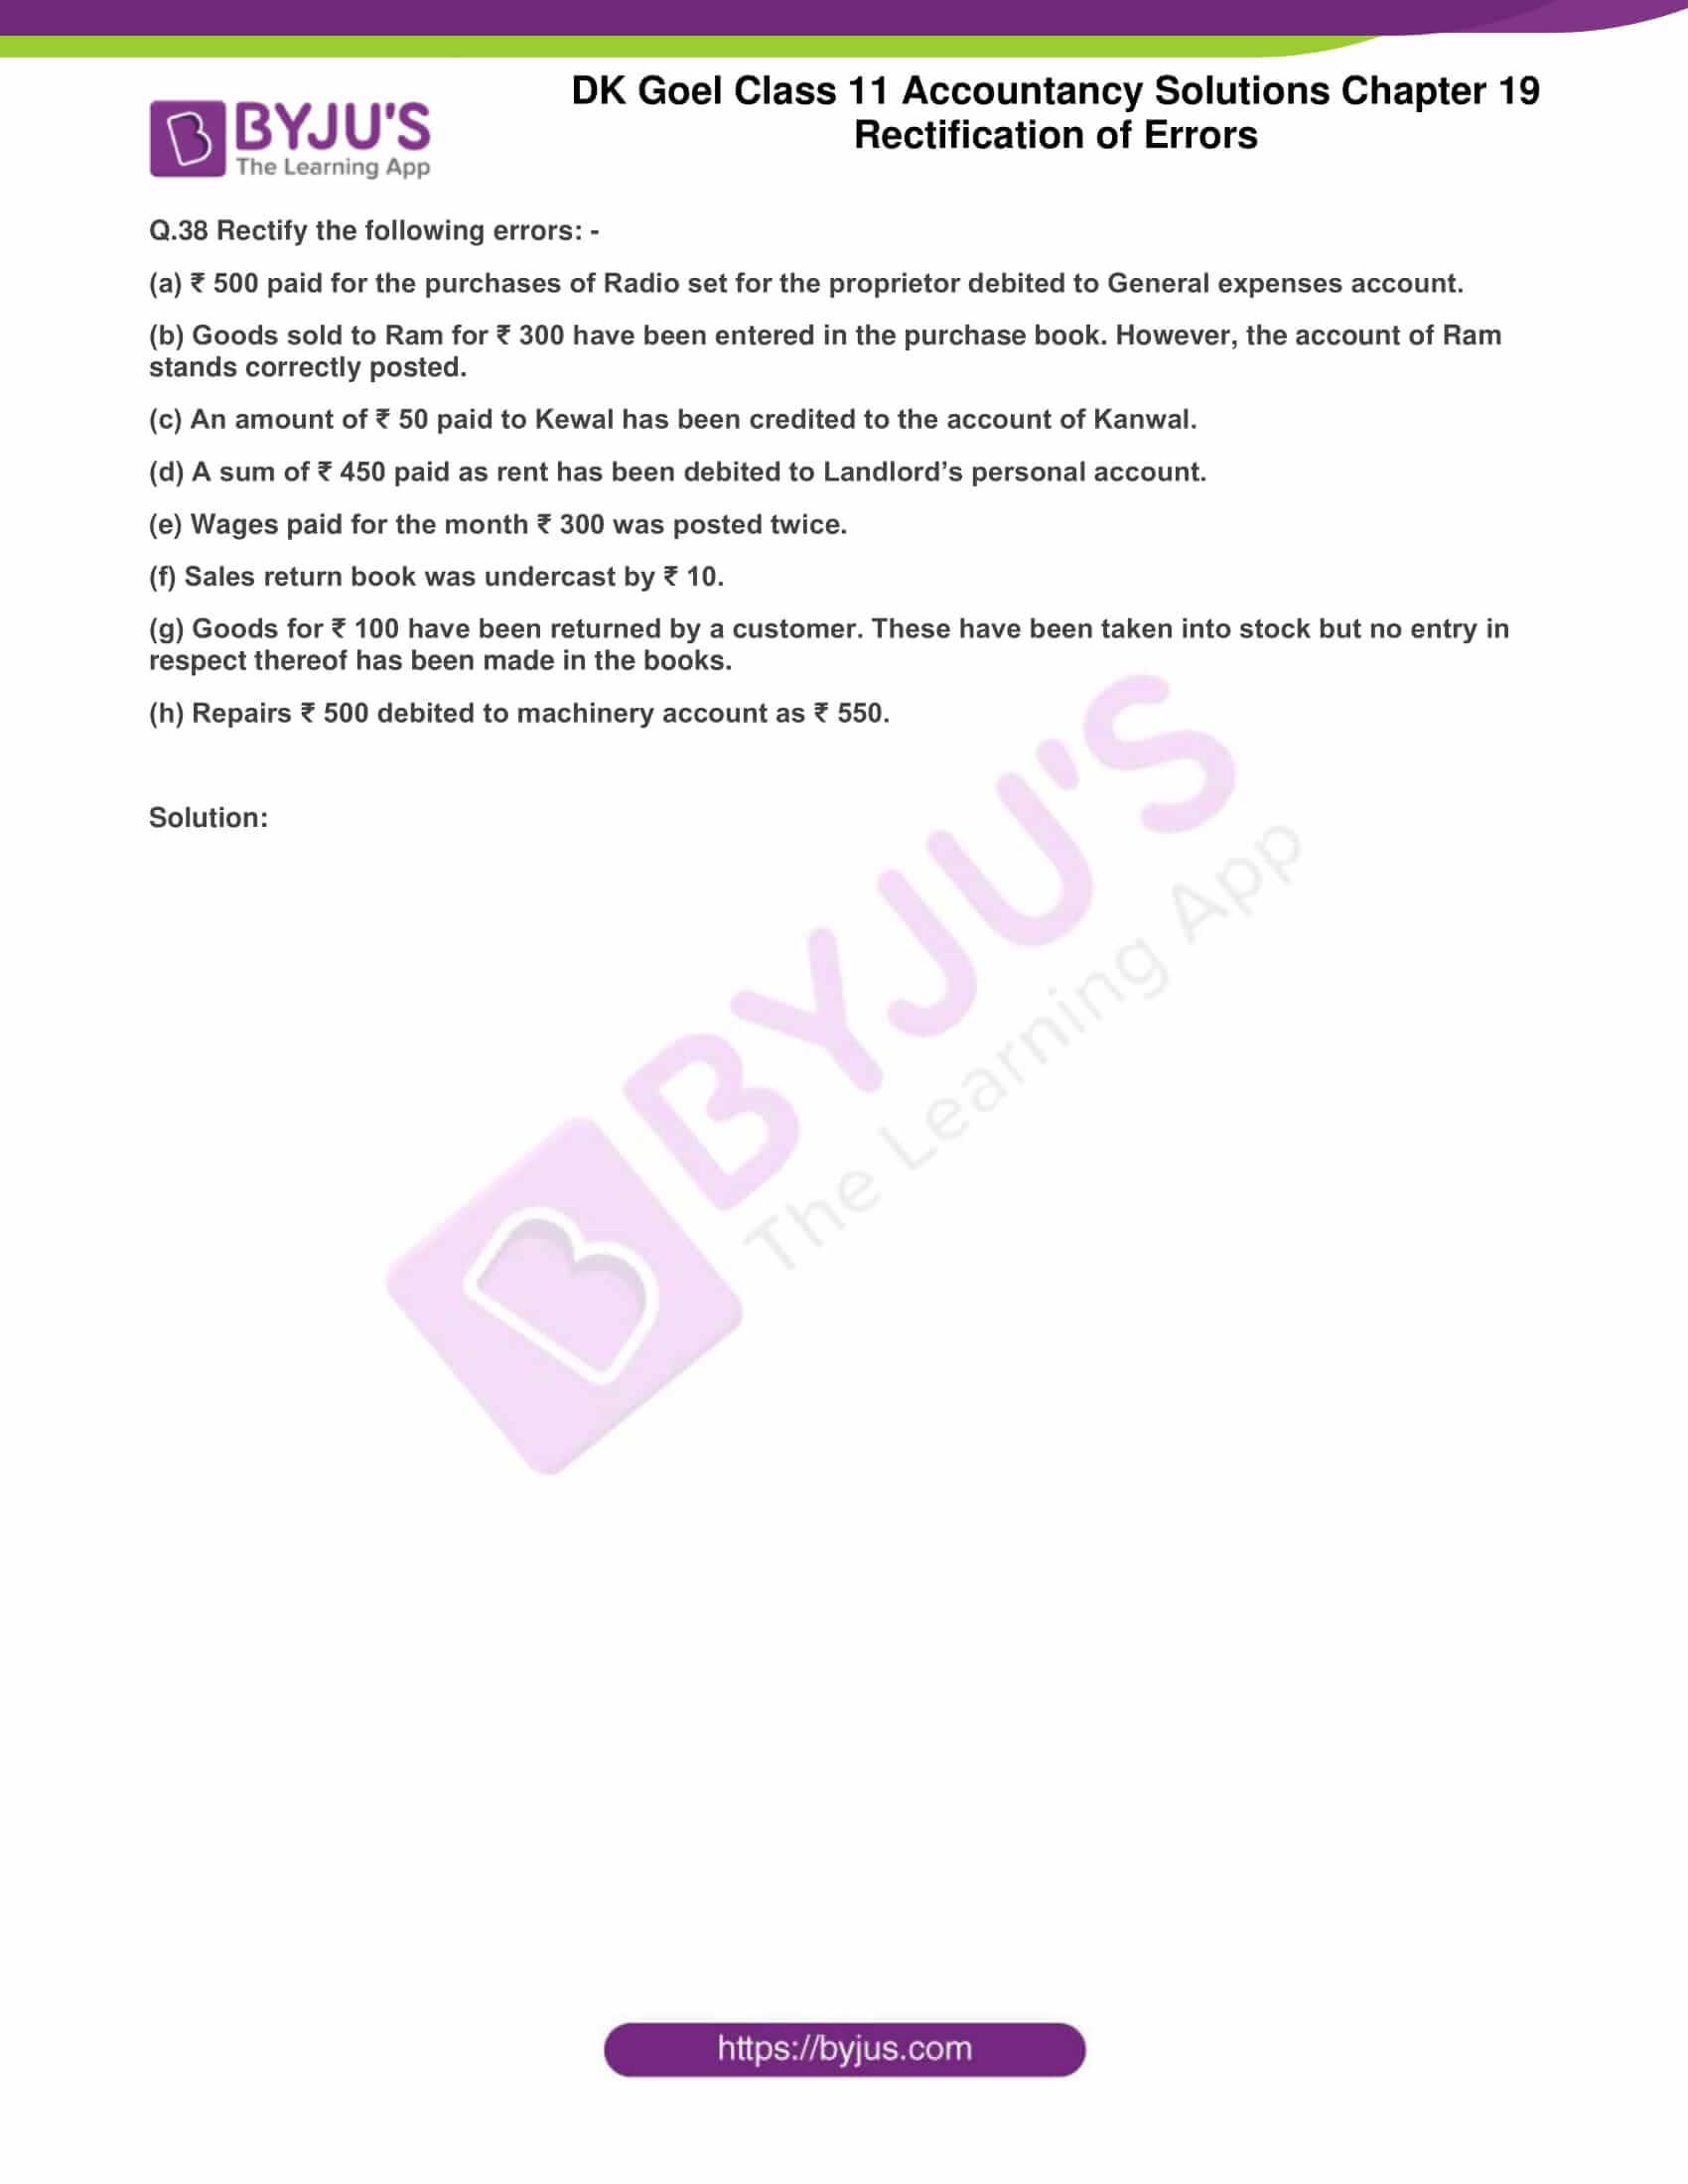 dk goel solutions class 11 accountancy chapter 19 rectification 72